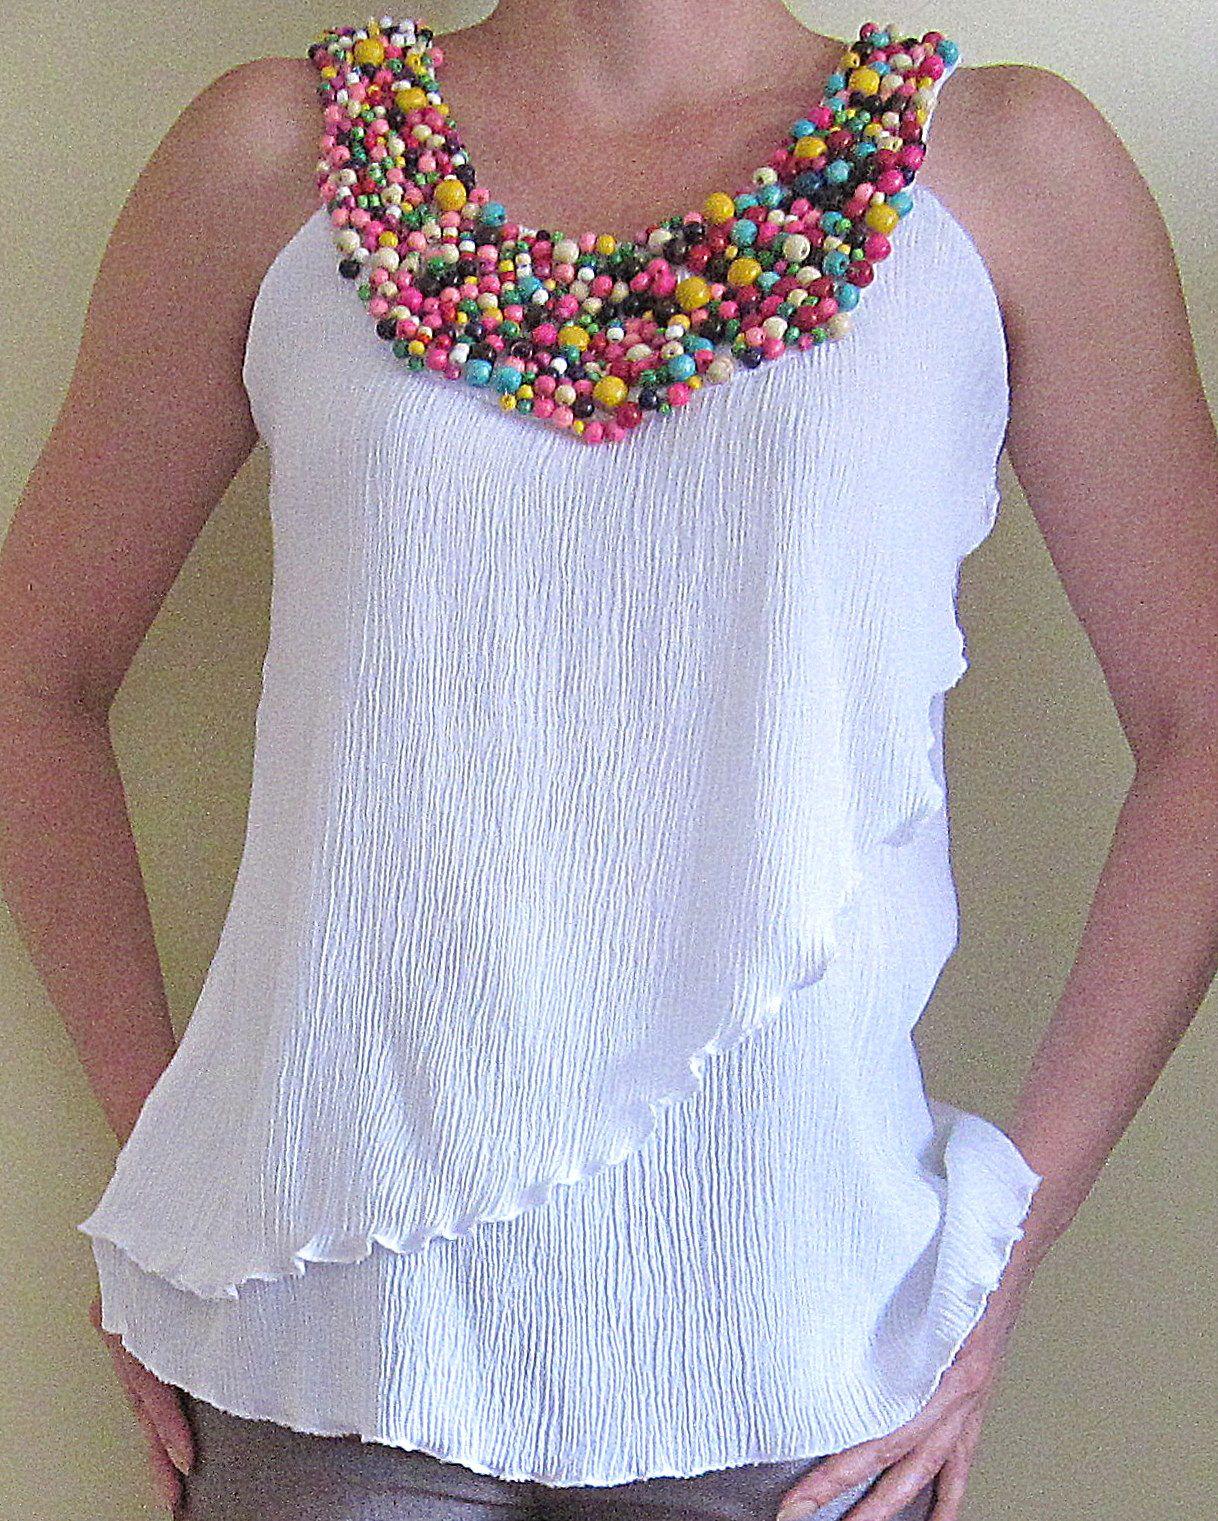 blusas modernas moda de verano